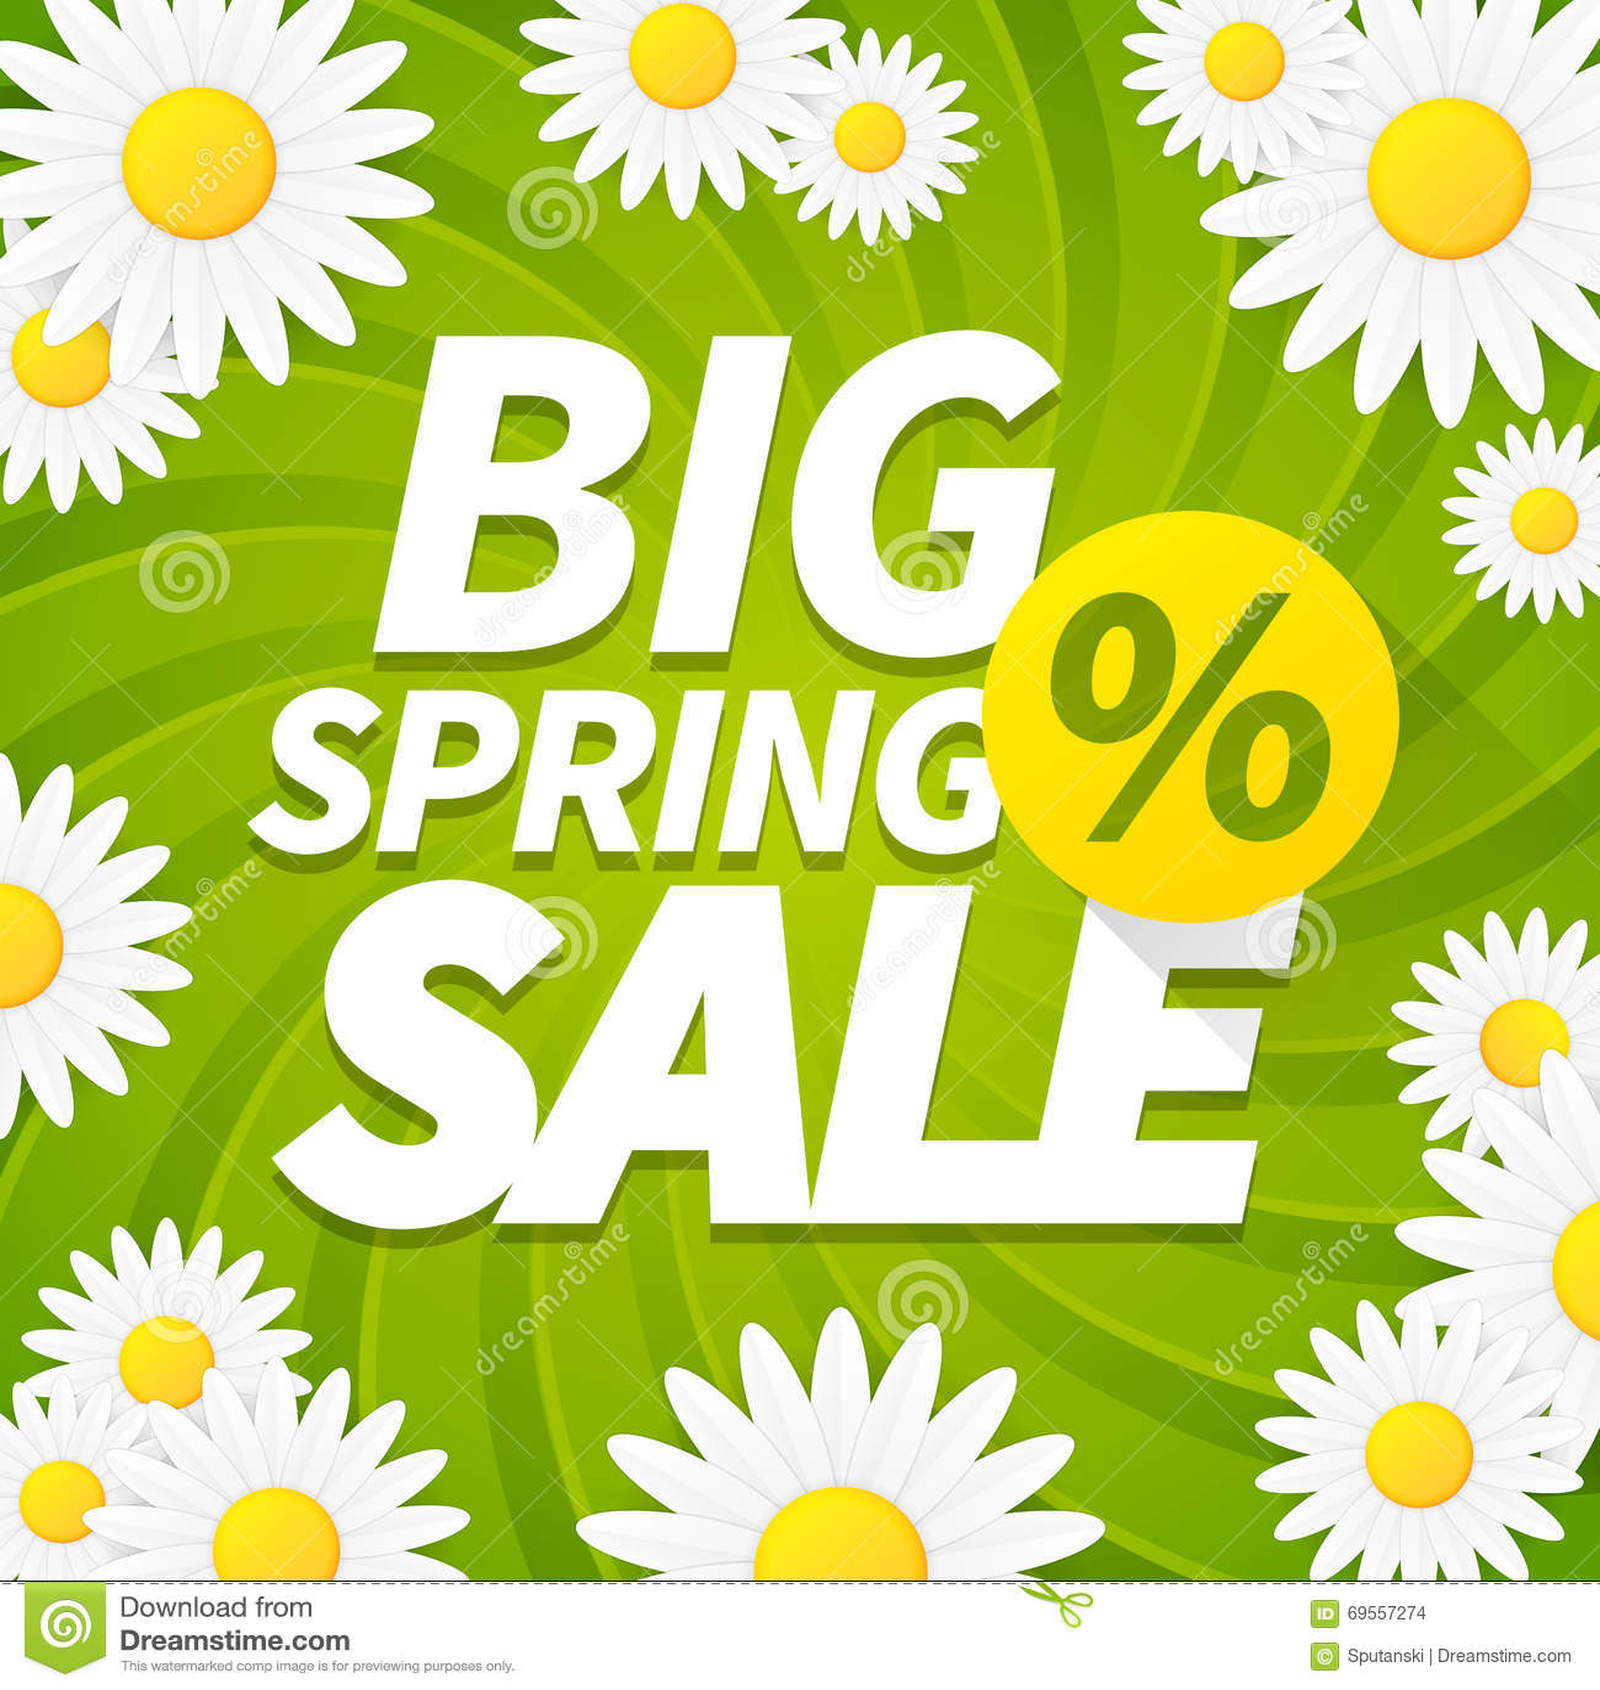 Seasonal big spring sales business background